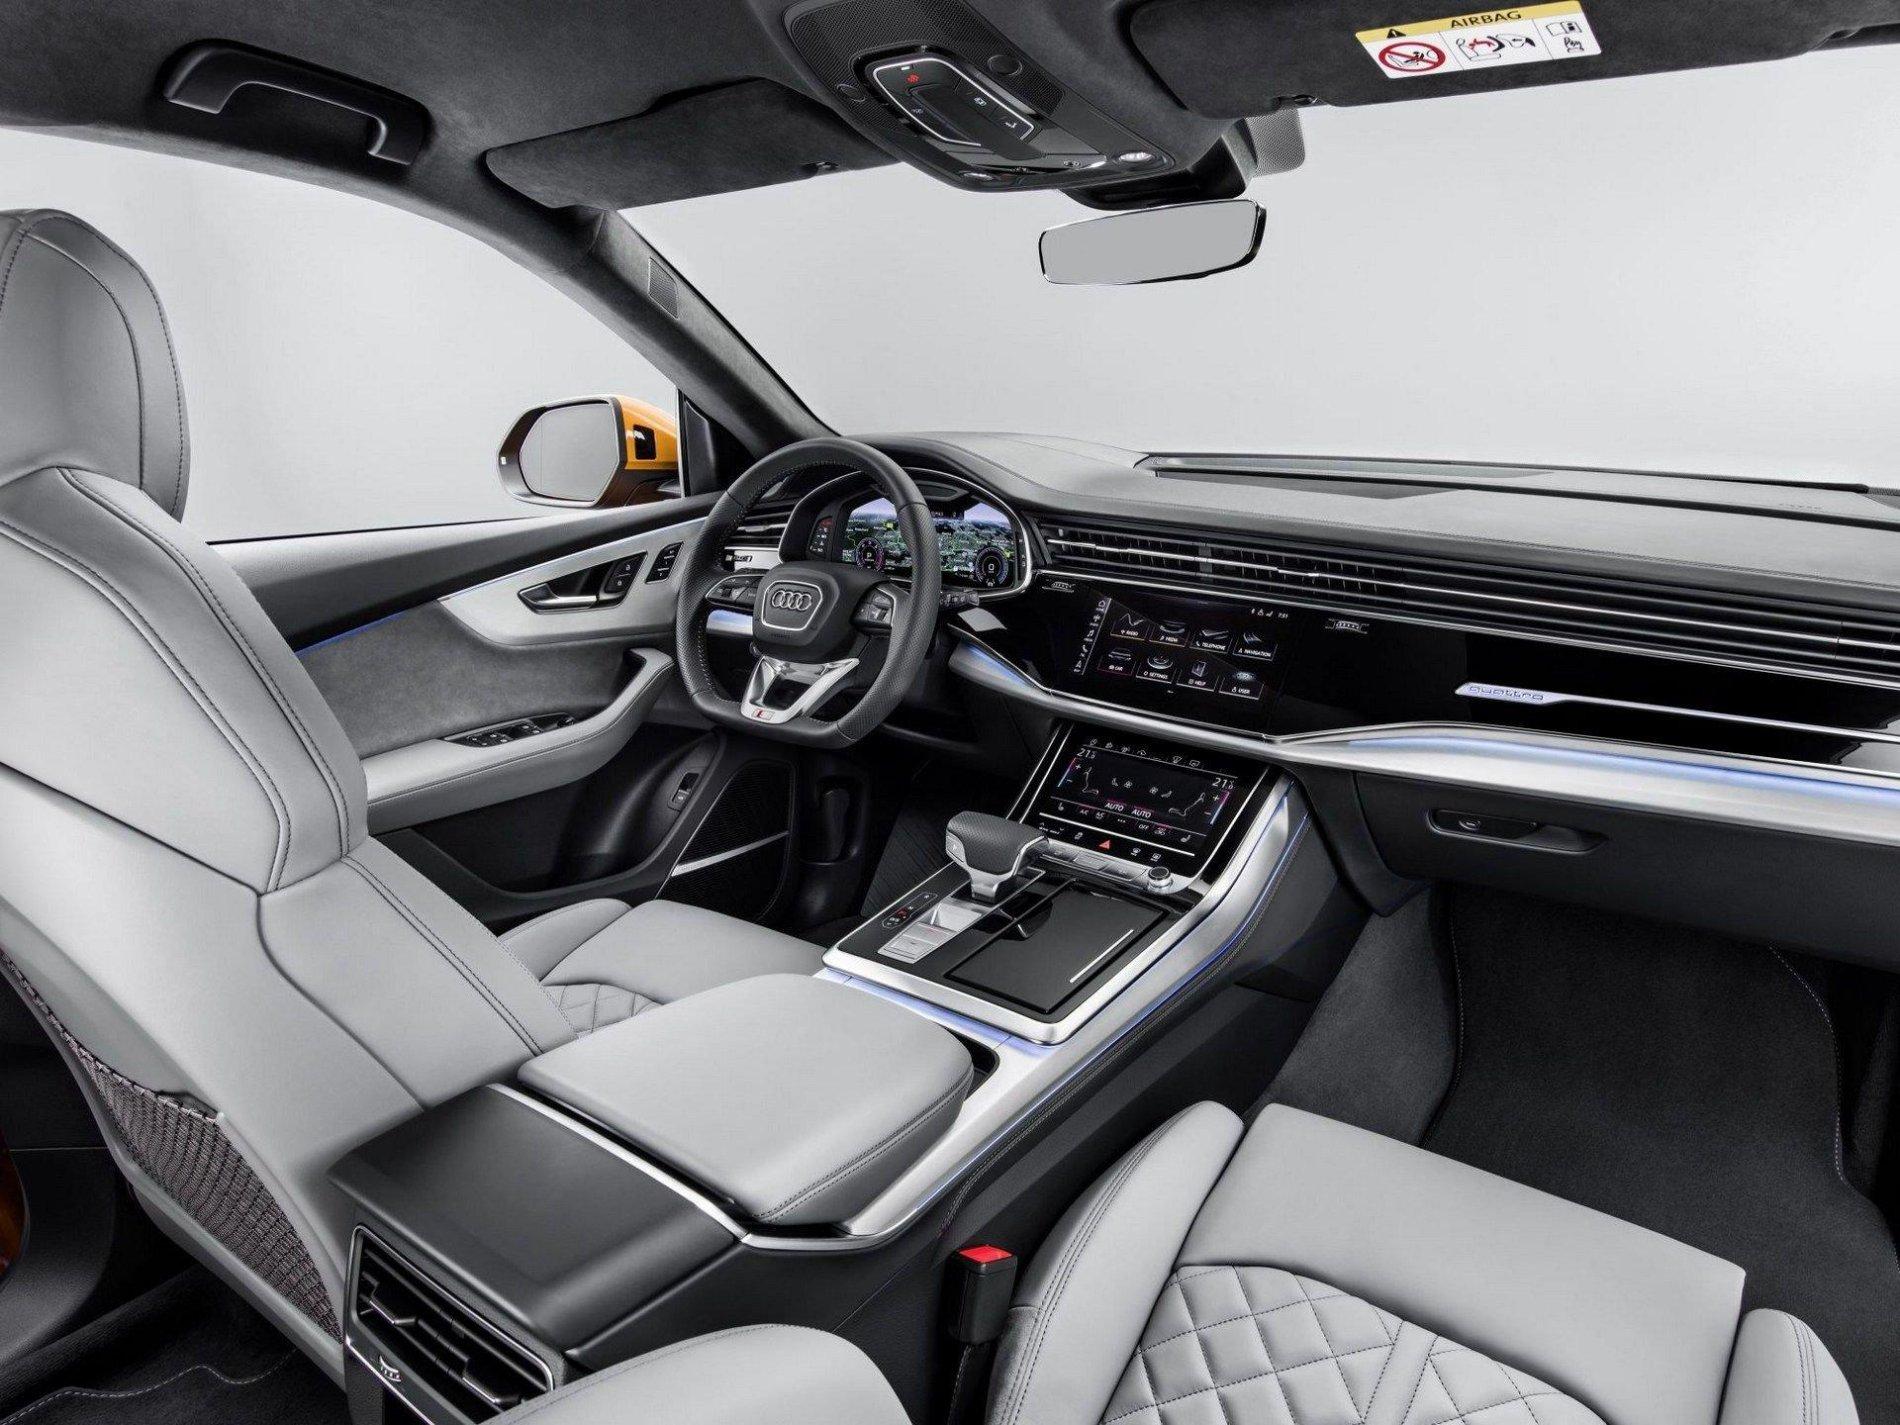 Audi Q8 - Audi Q8